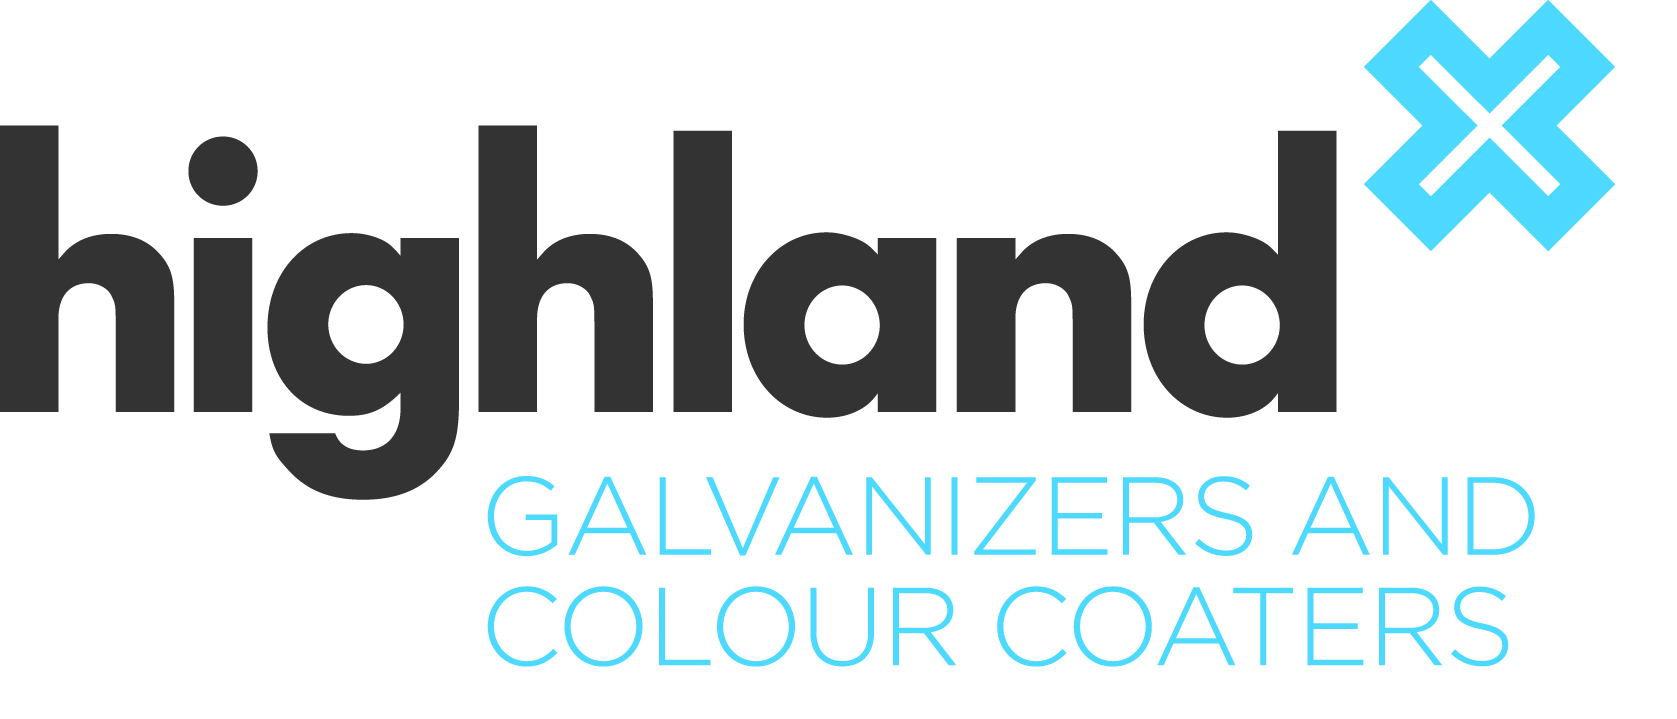 Highland Colour Coaters Ltd